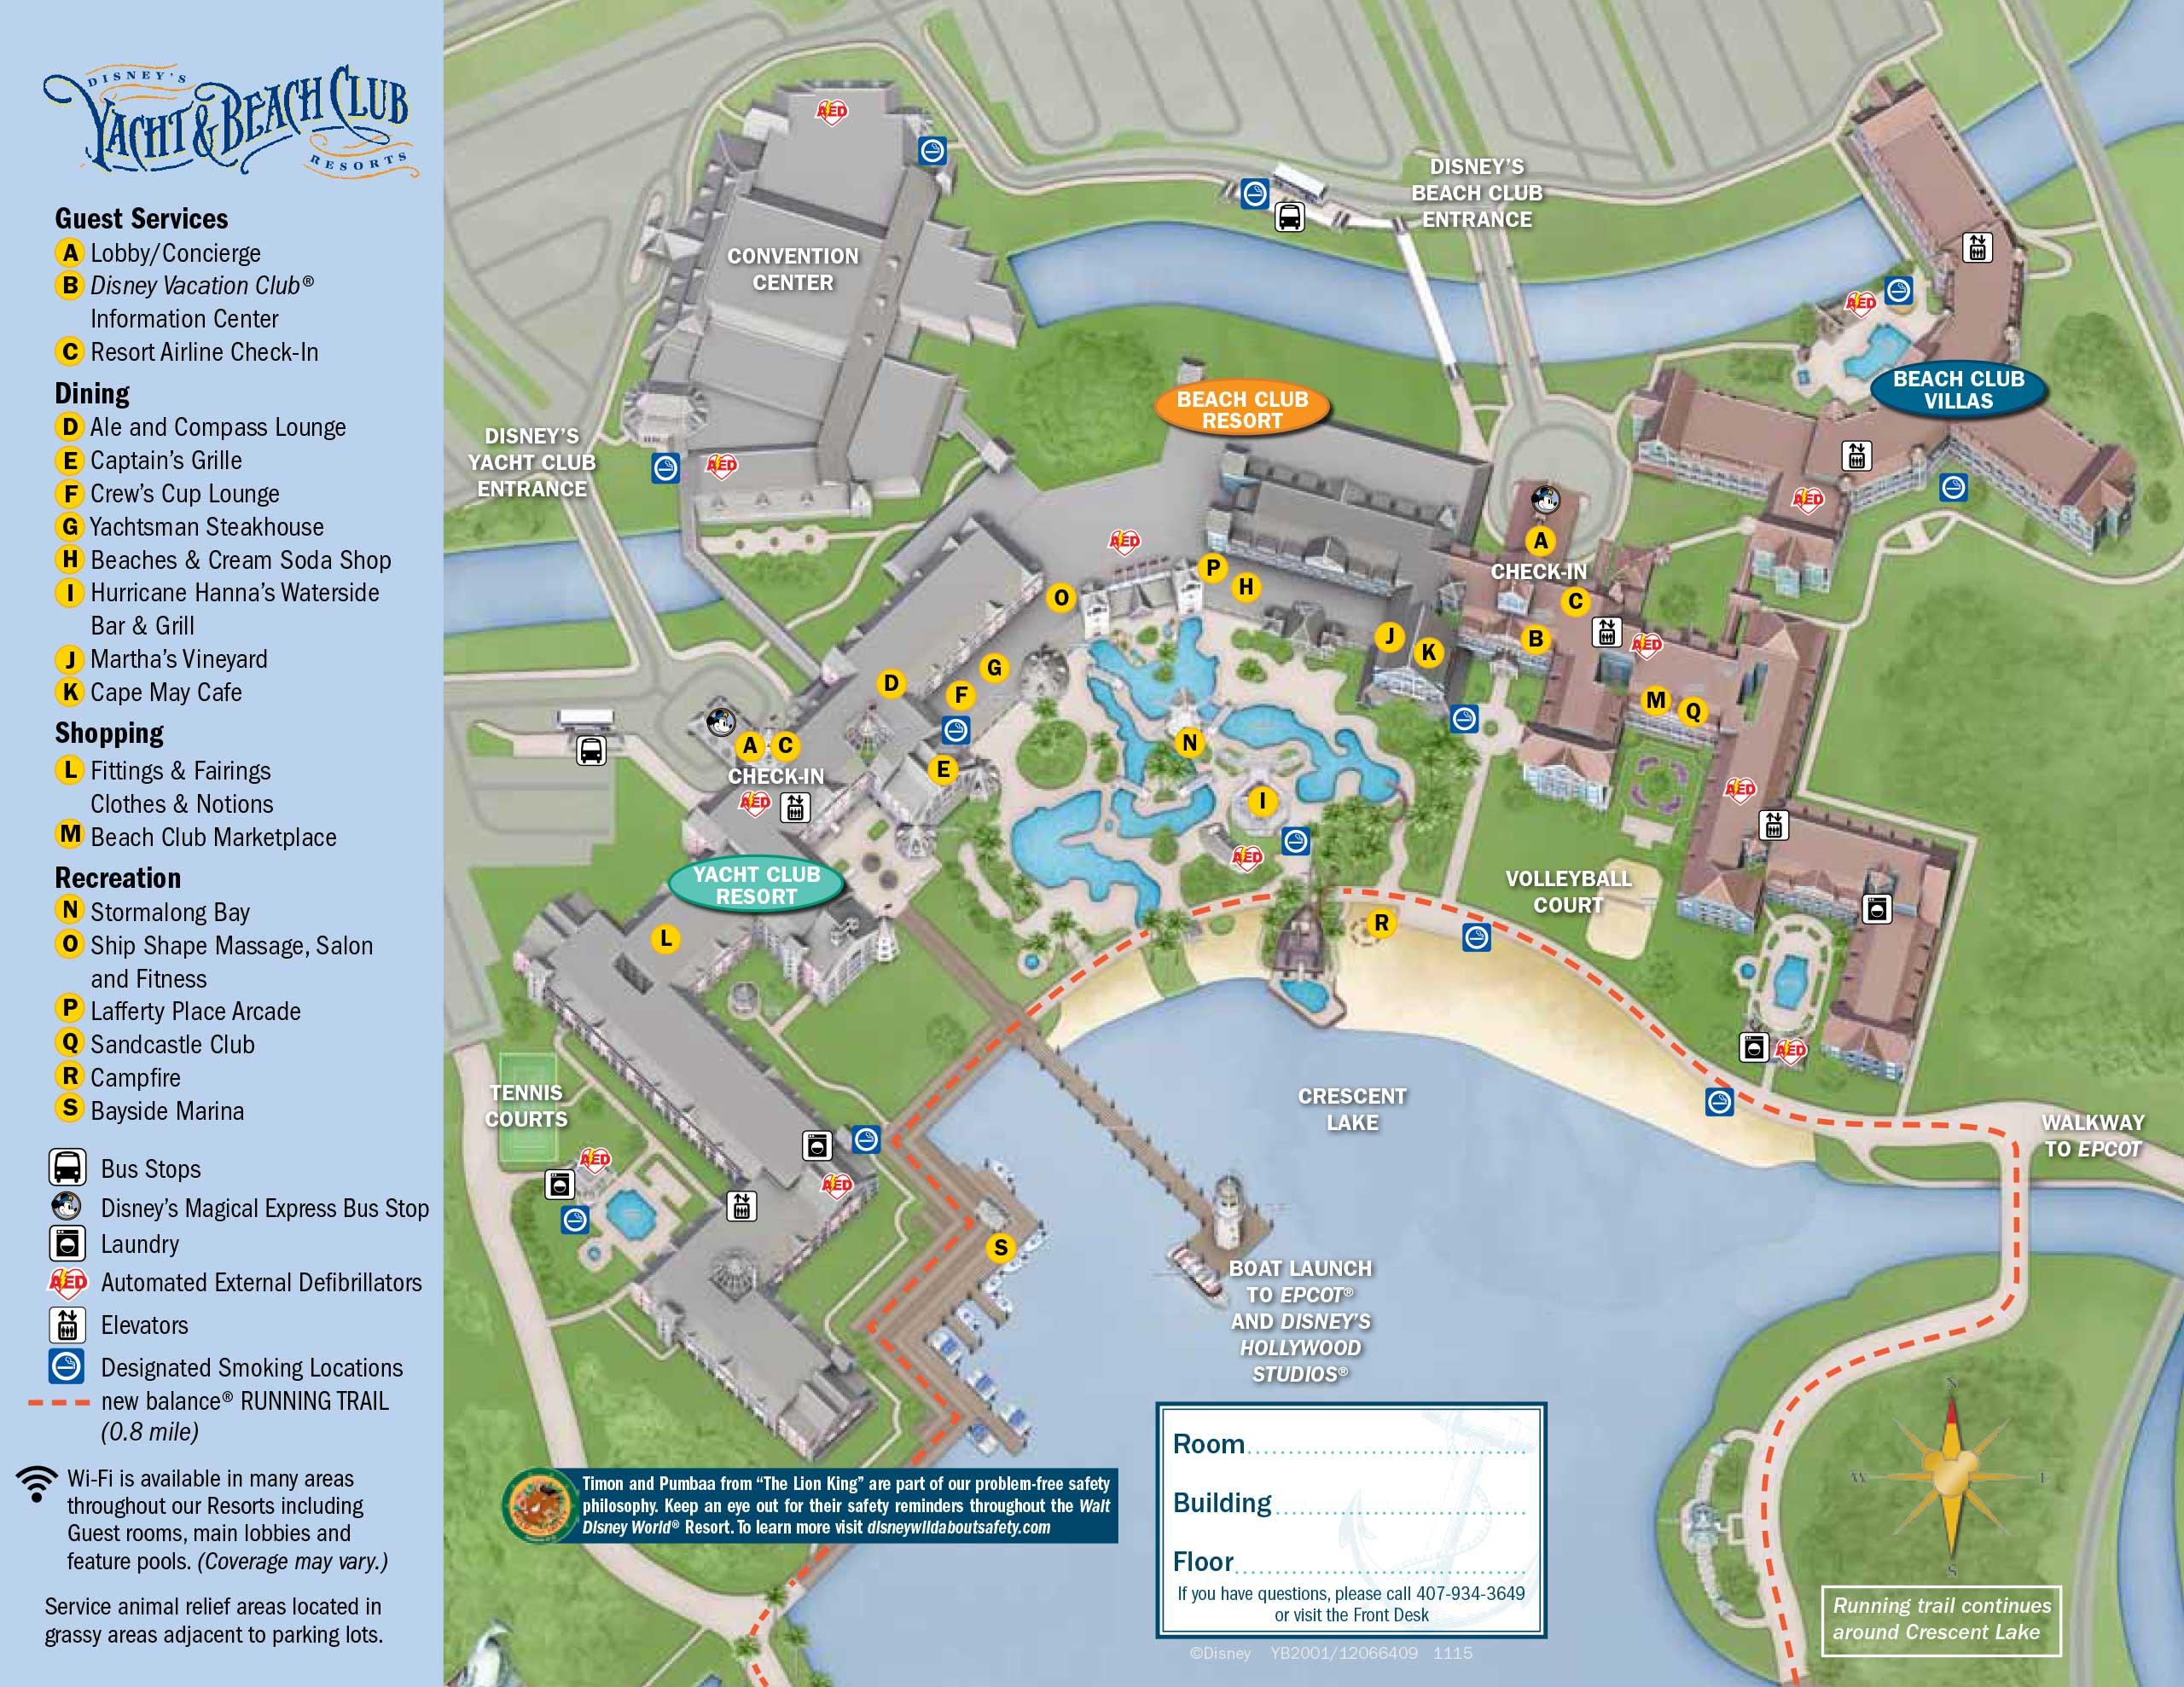 April 2017 Walt Disney World Resort Hotel Maps - Photo 33 of 33 on